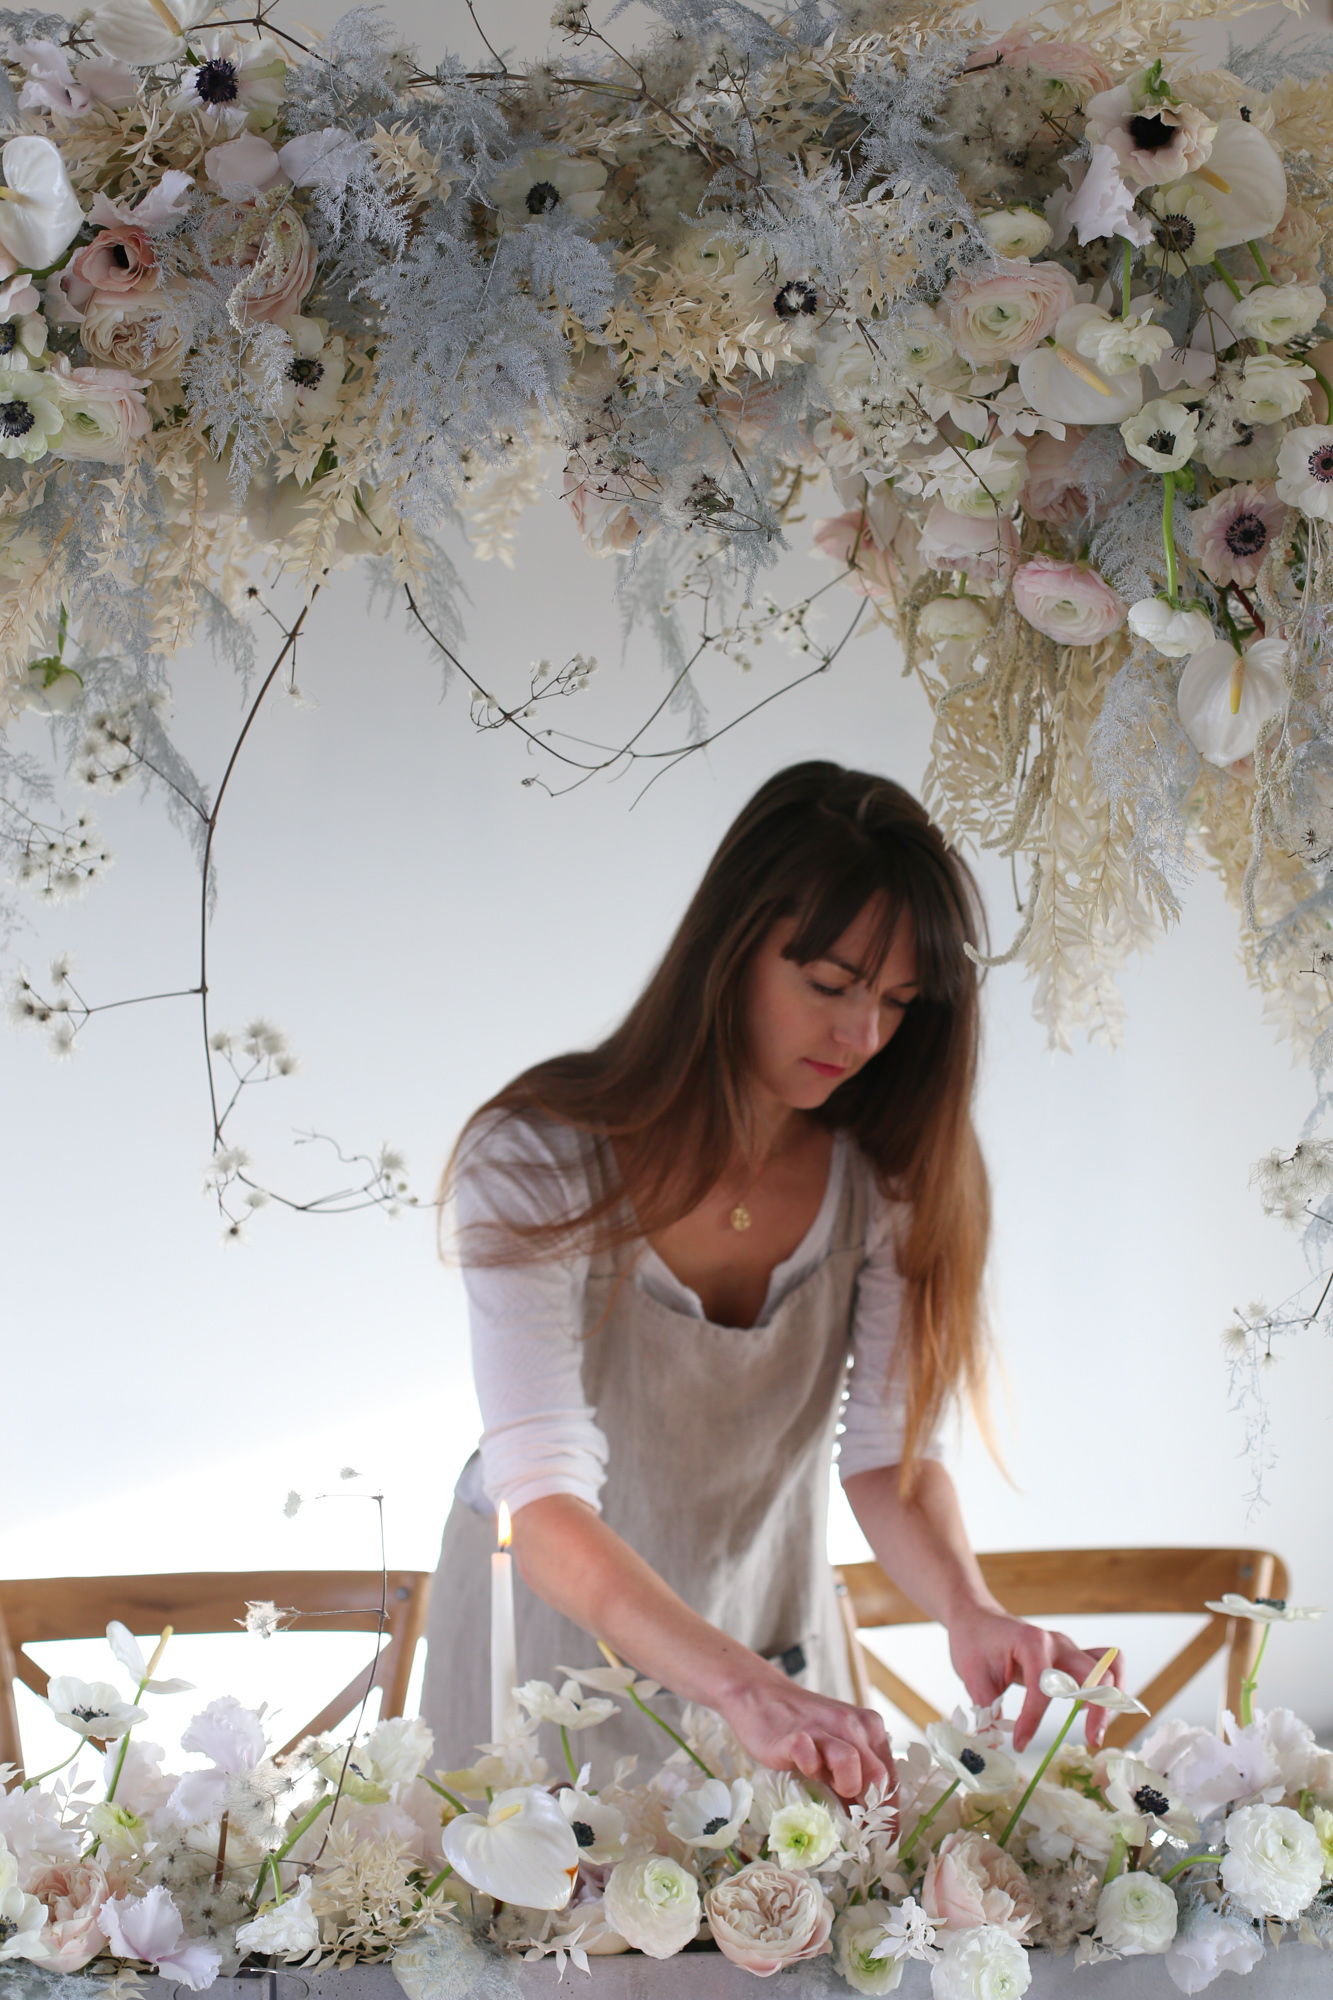 Apprendre la fleuristerie - Formation